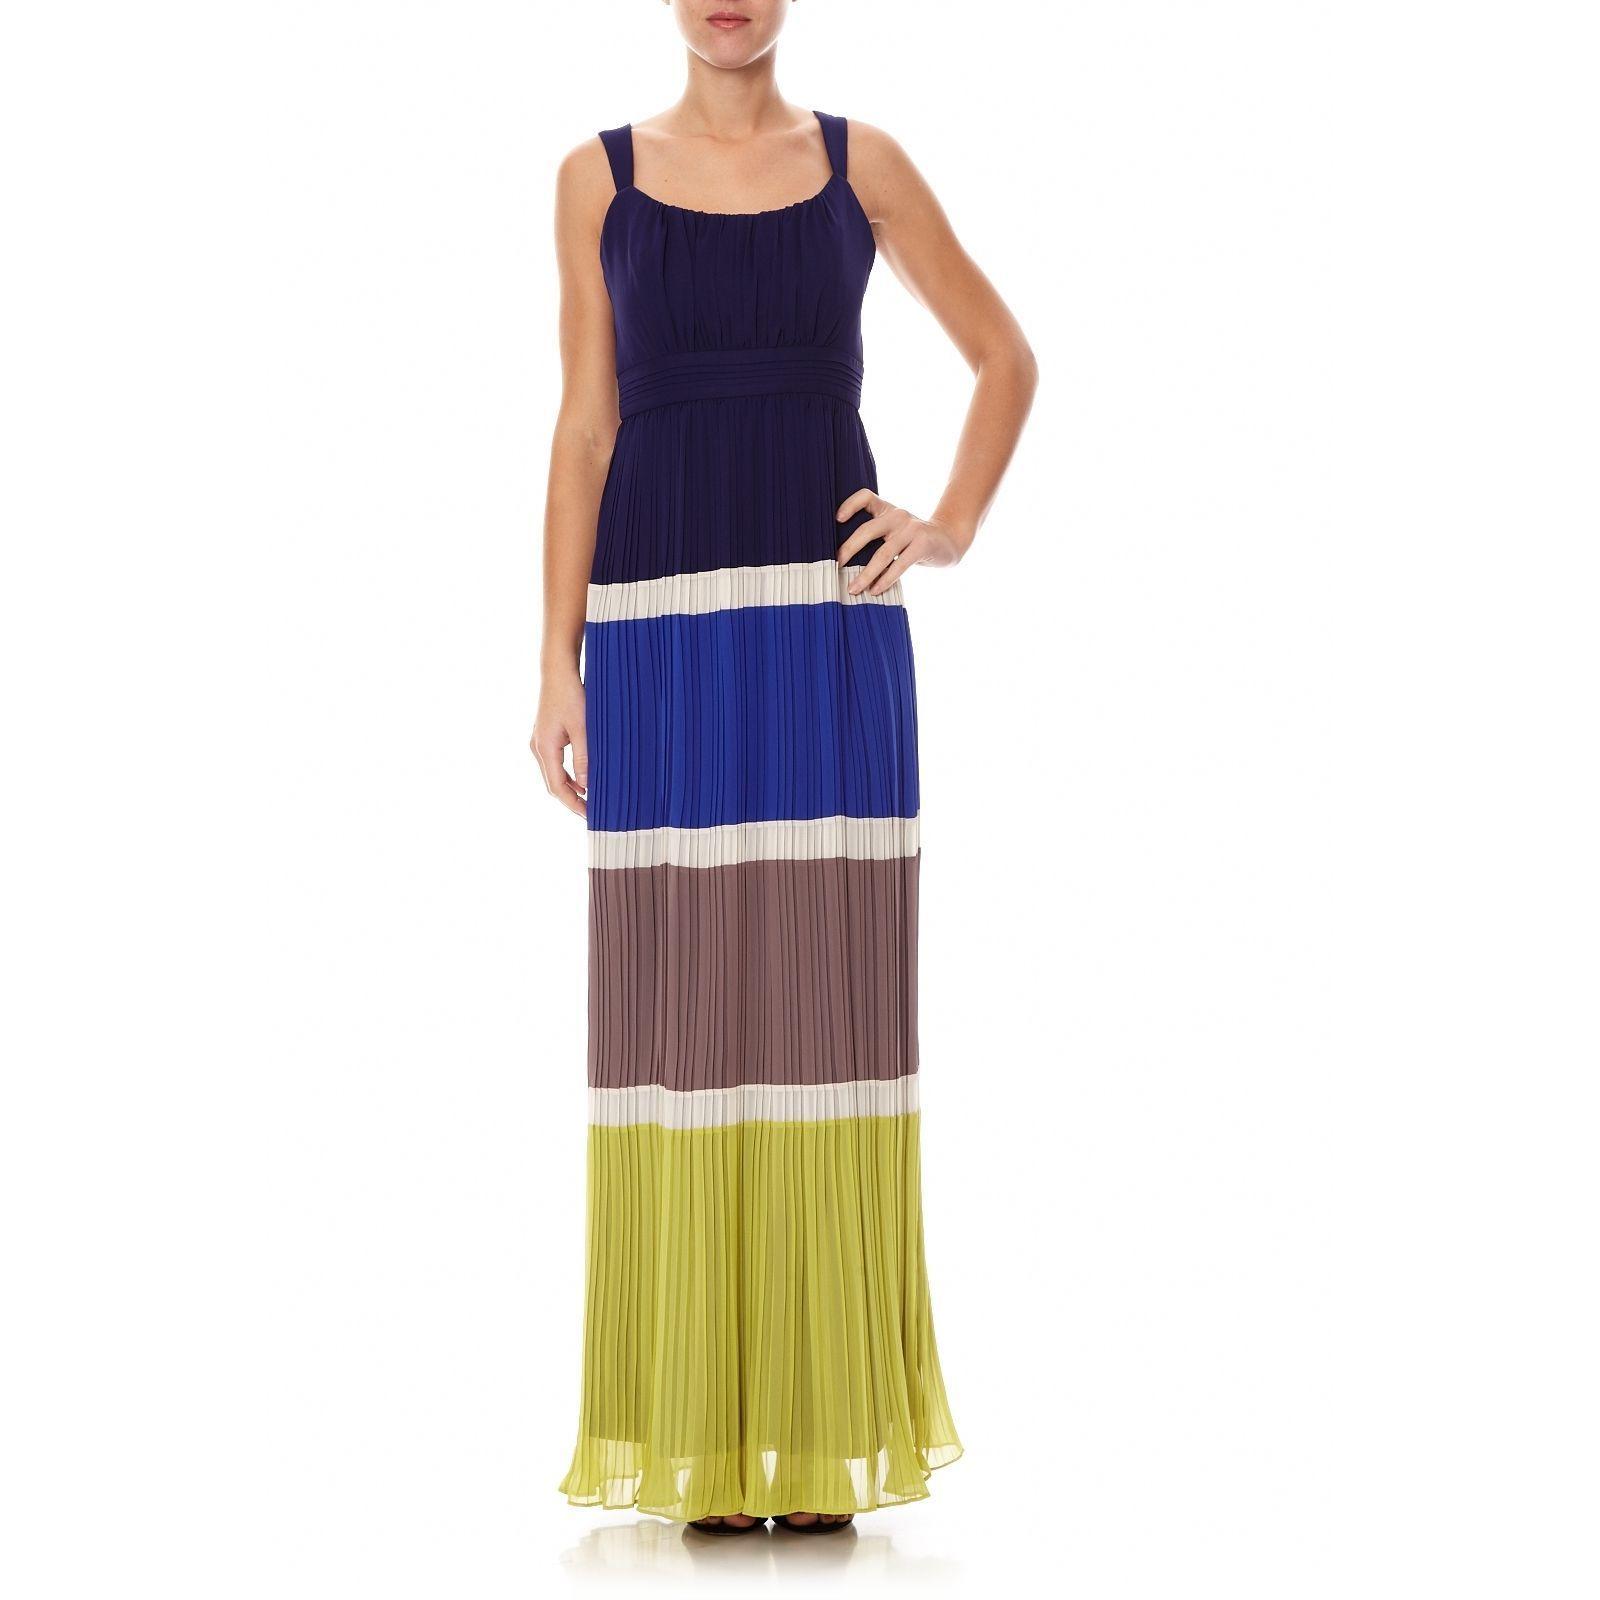 3a2fd089d6c Manoukian robe belle robe soirée